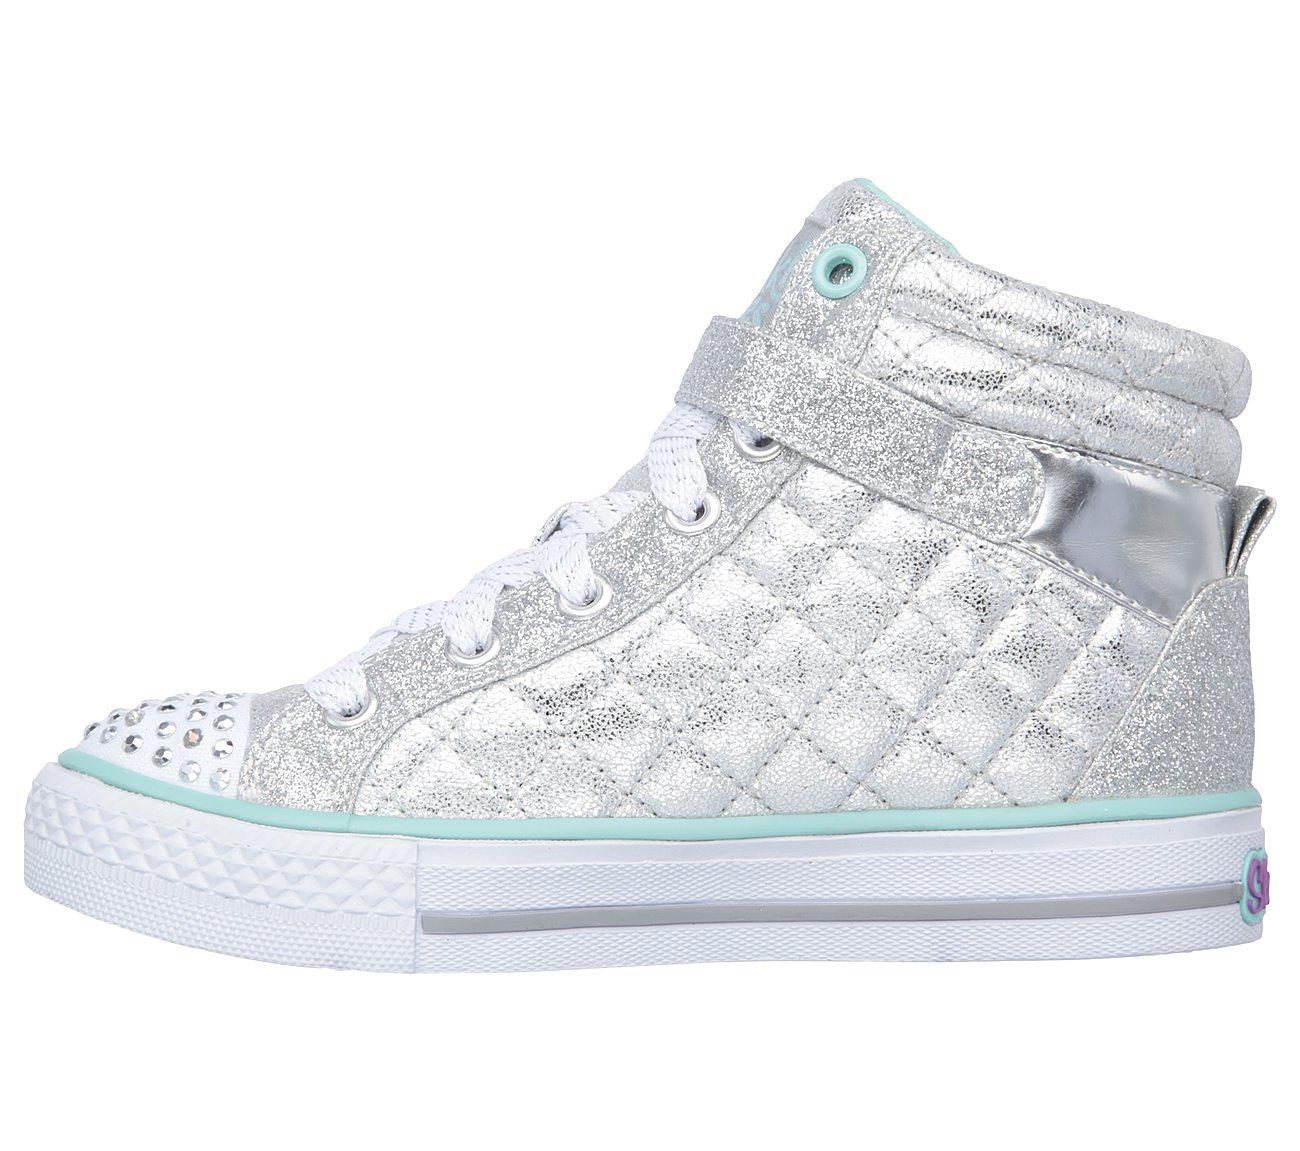 Buy SKECHERS Twinkle Toes  Shuffles - Sweetheart Sole S-Lights Shoes ... ab3daab56d0